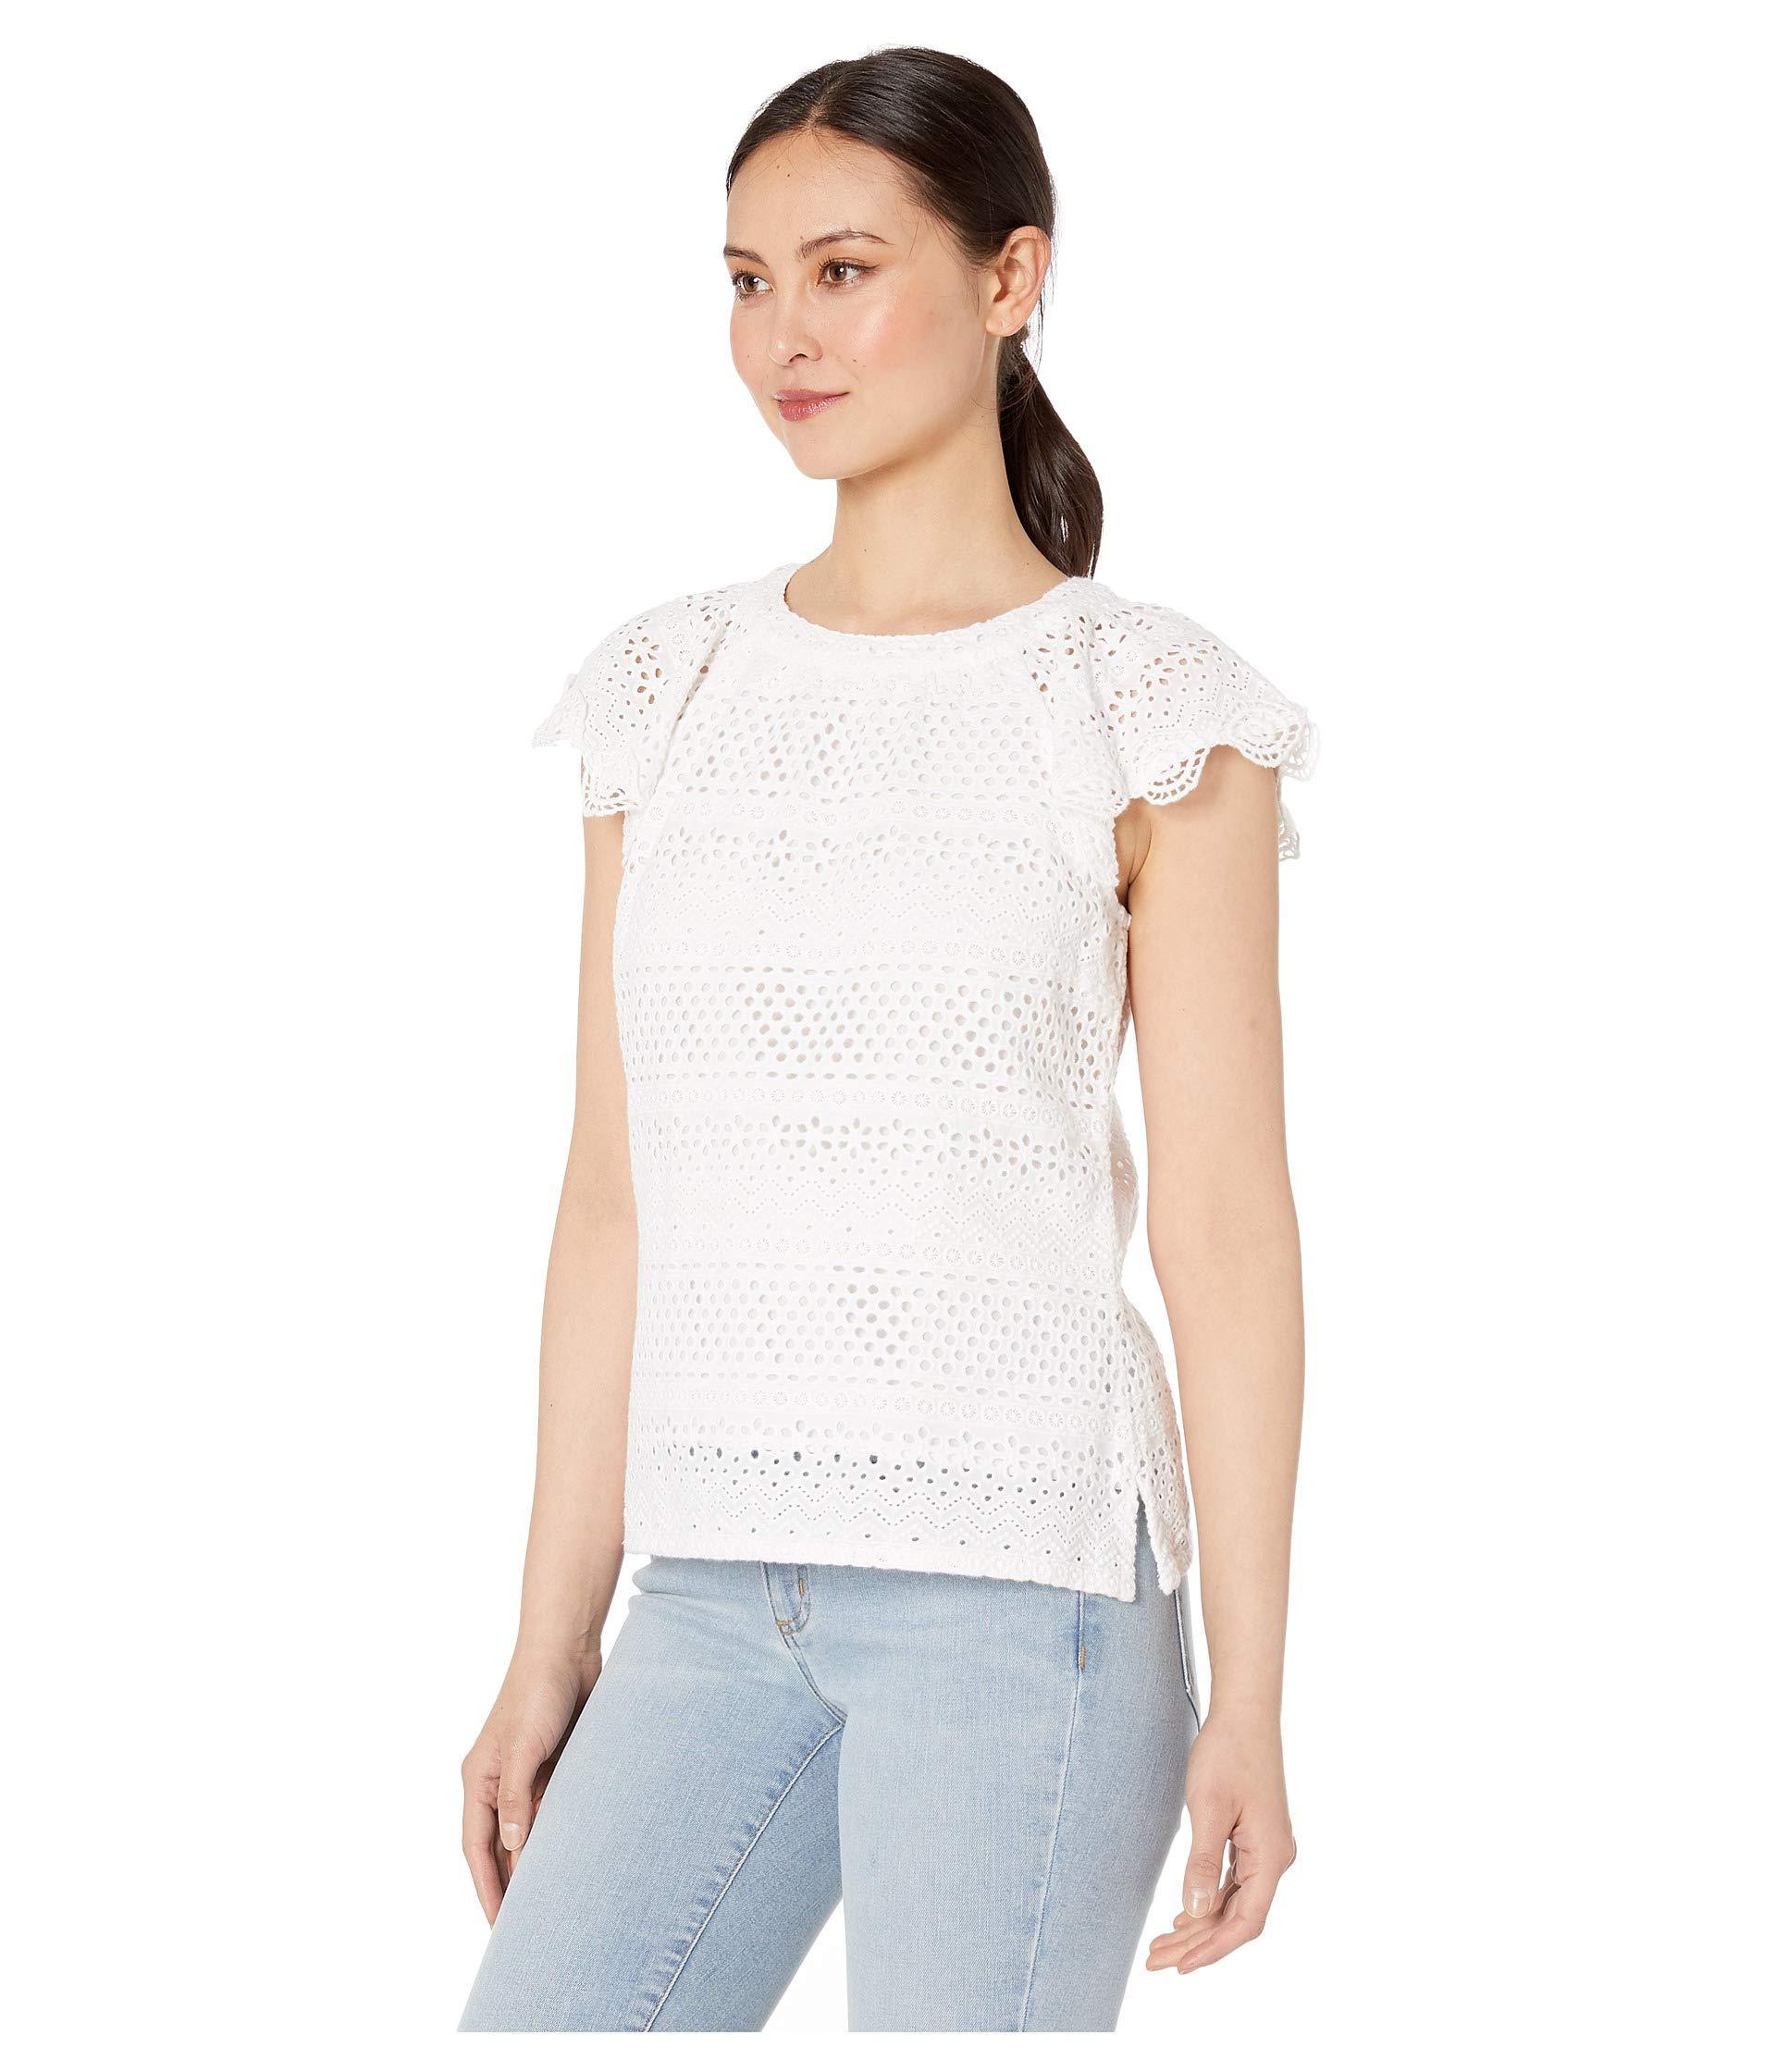 45a3c73ac80 Lyst - Lauren by Ralph Lauren Eyelet Cotton Top (white) Women's ...